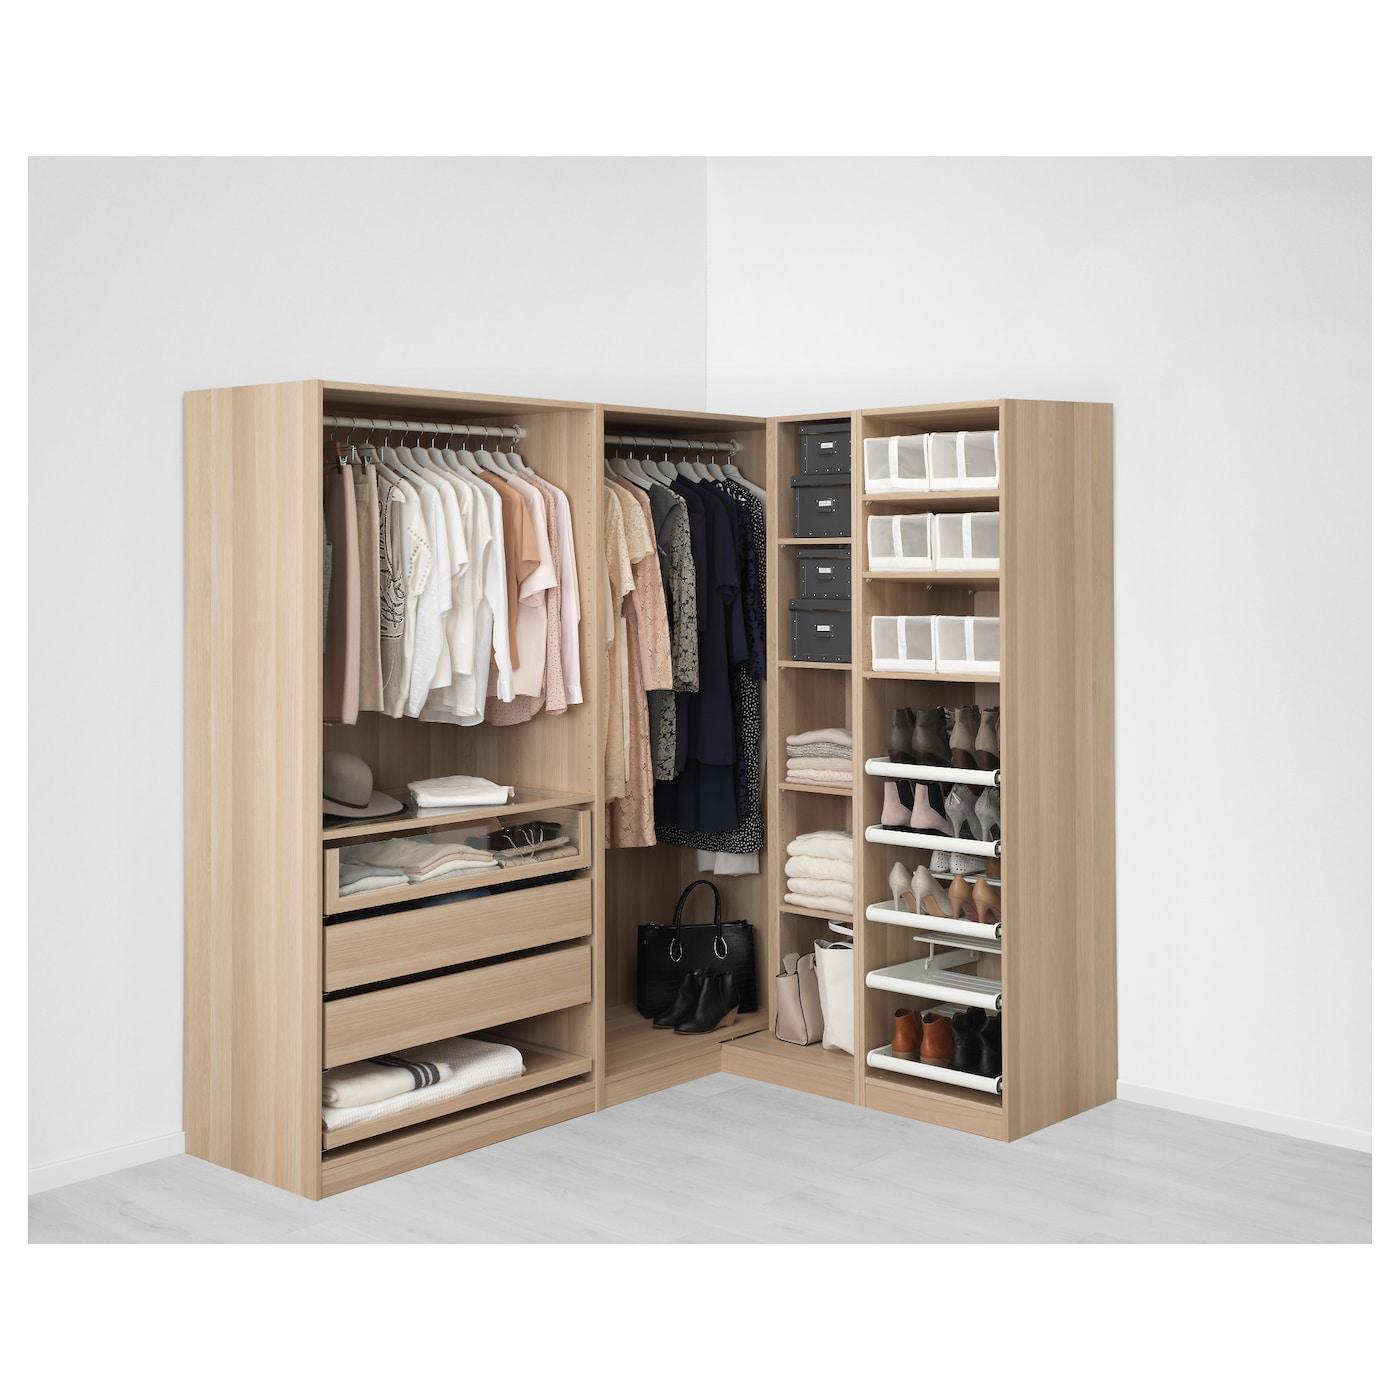 pax hoekkledingkast wit gelazuurd eikeneffect nexus vikedal 210 160 x 201 cm ikea. Black Bedroom Furniture Sets. Home Design Ideas